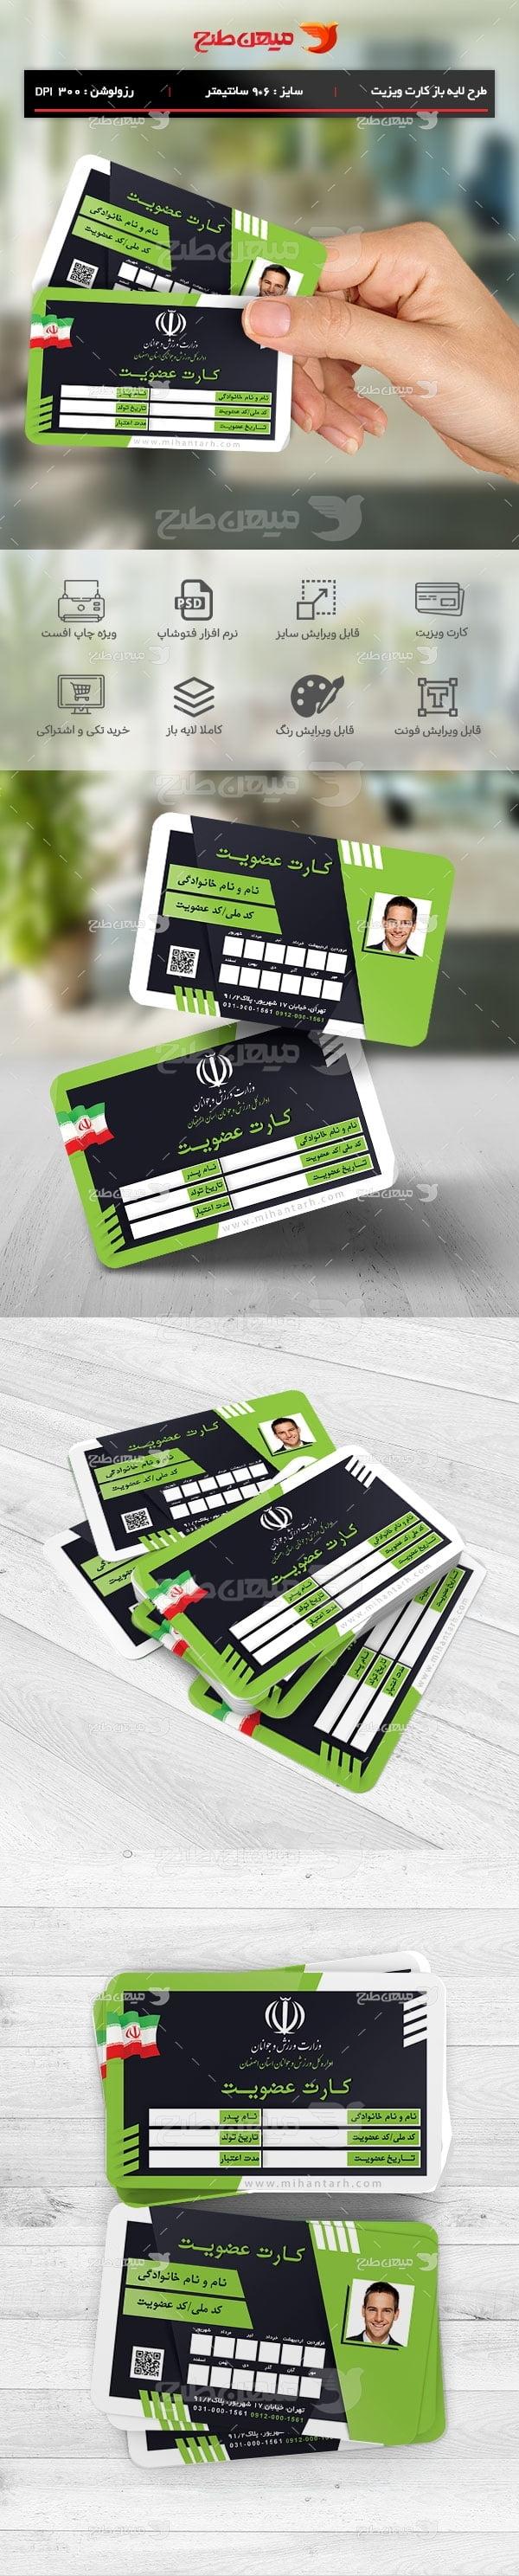 طرح لایه باز کارت ویزیت عضویت و مشخصات فردی